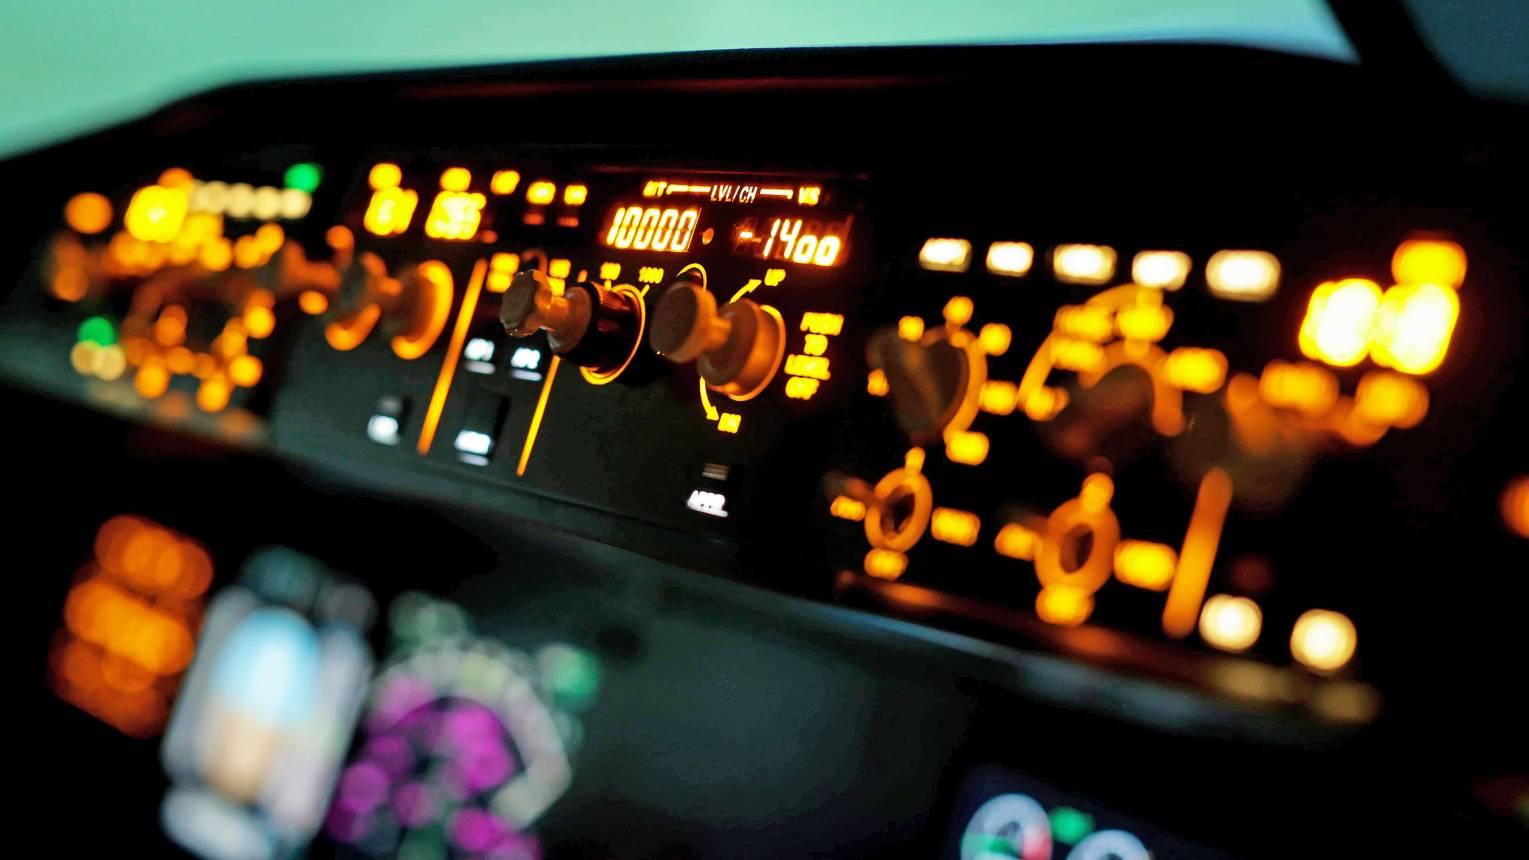 Airbus 320 repülőgép szimulátor